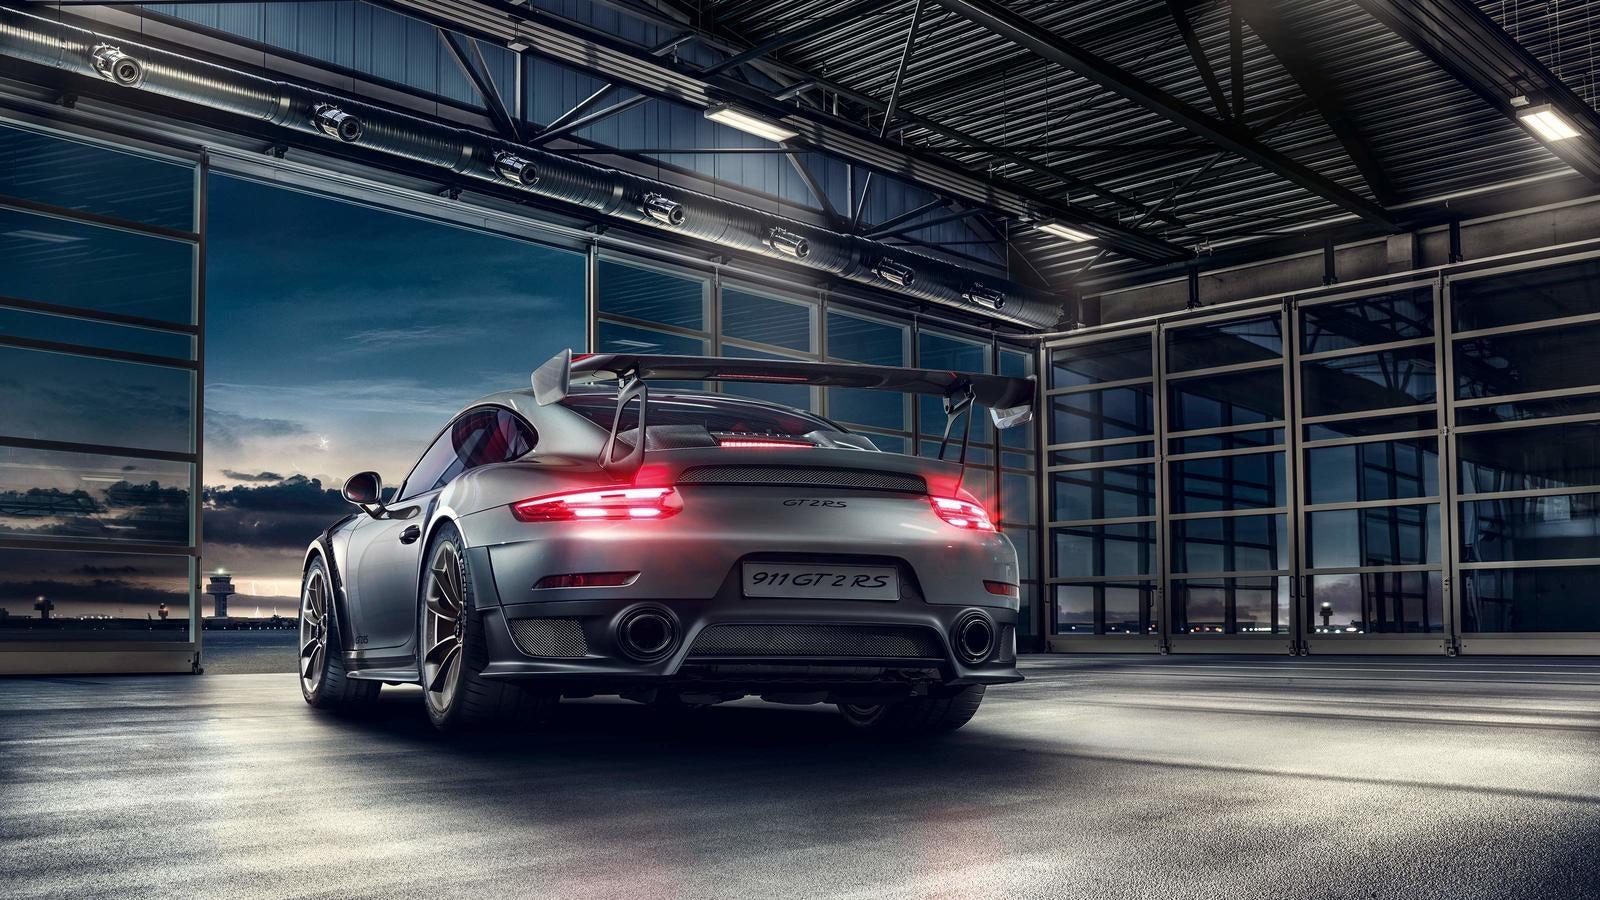 How Would You Configure Your $380,000 Porsche 911 GT2 RS?